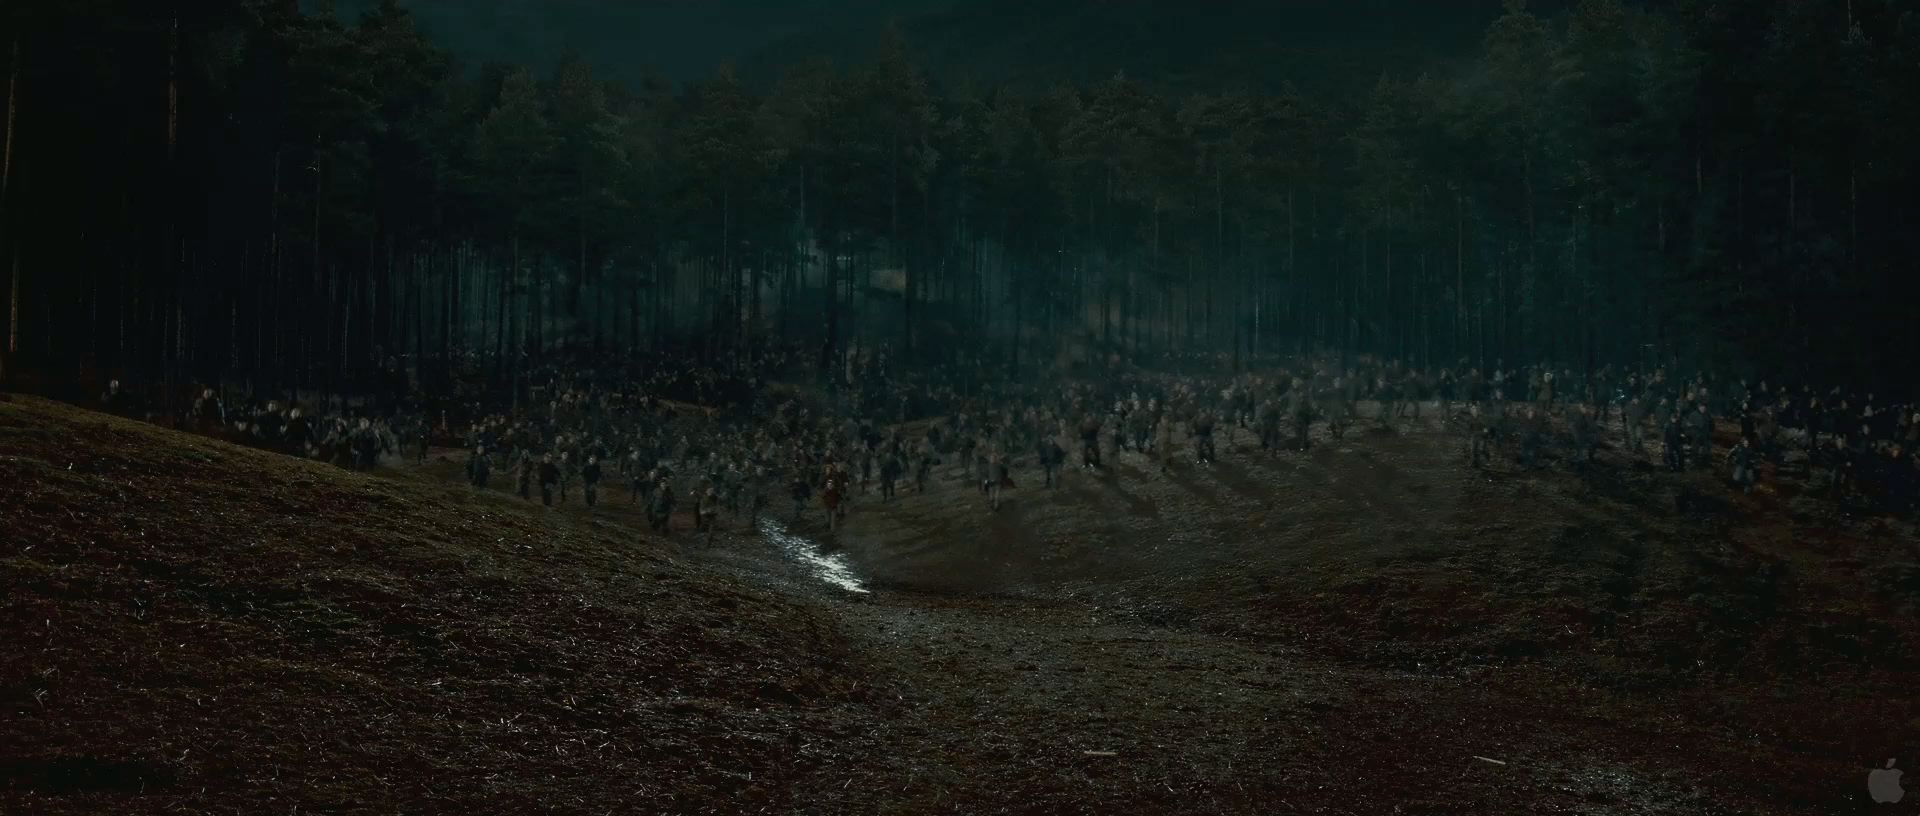 Harry Potter BlogHogwarts HP7 2 Trailer 61